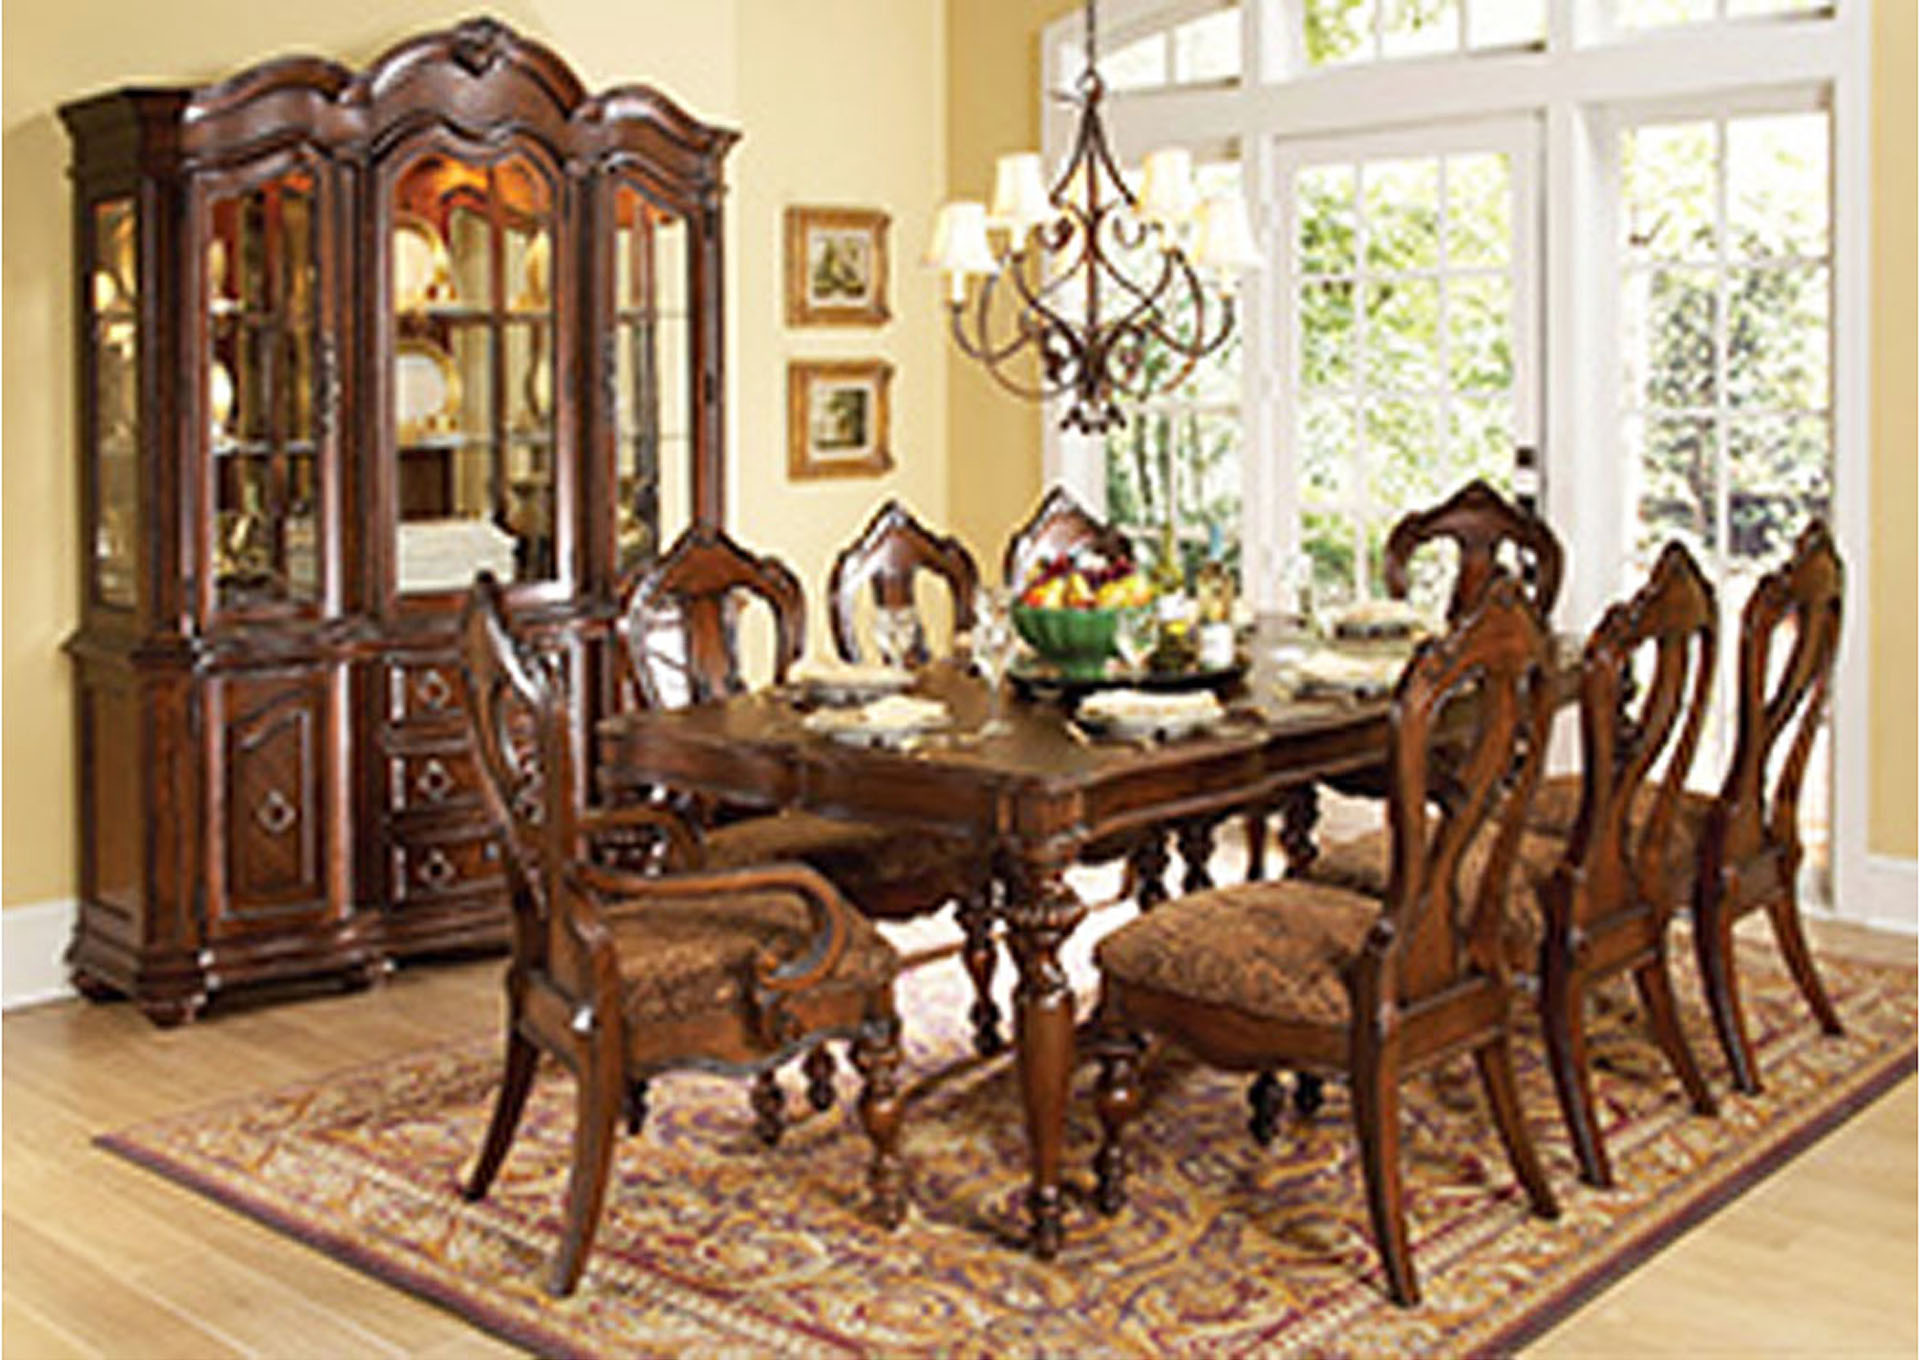 Hot Buys Furniture >> Hot Buys Furniture | Snellville, GA Prenzo Warm Brown